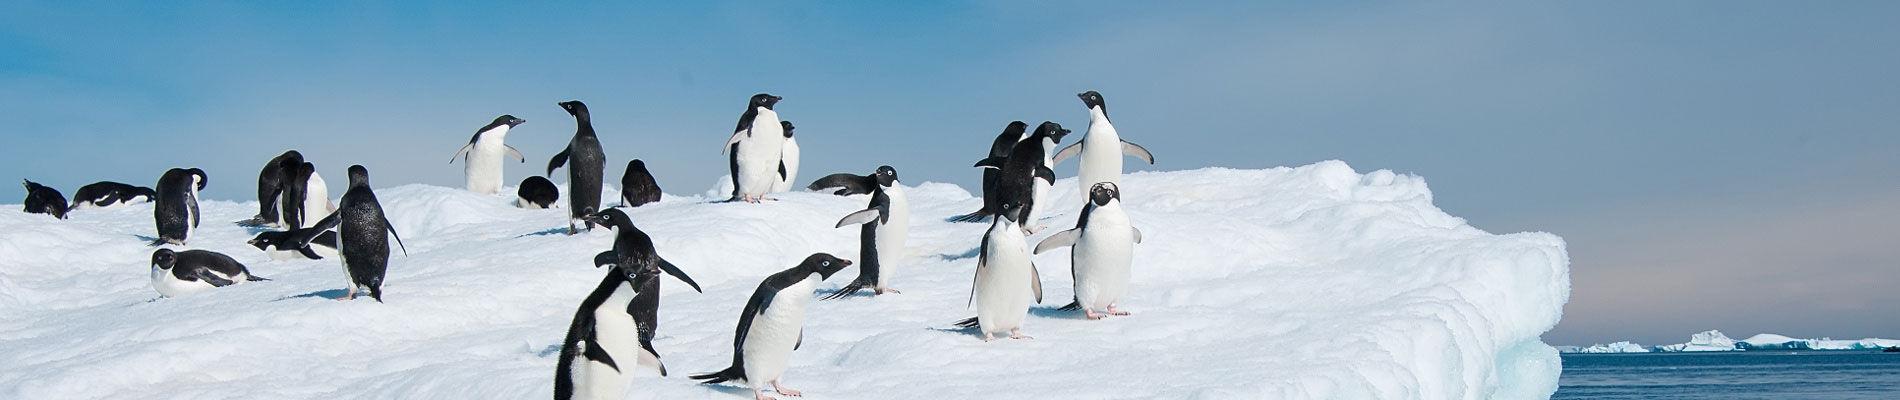 antarctique-pingouin-iceberg-croisiere-st